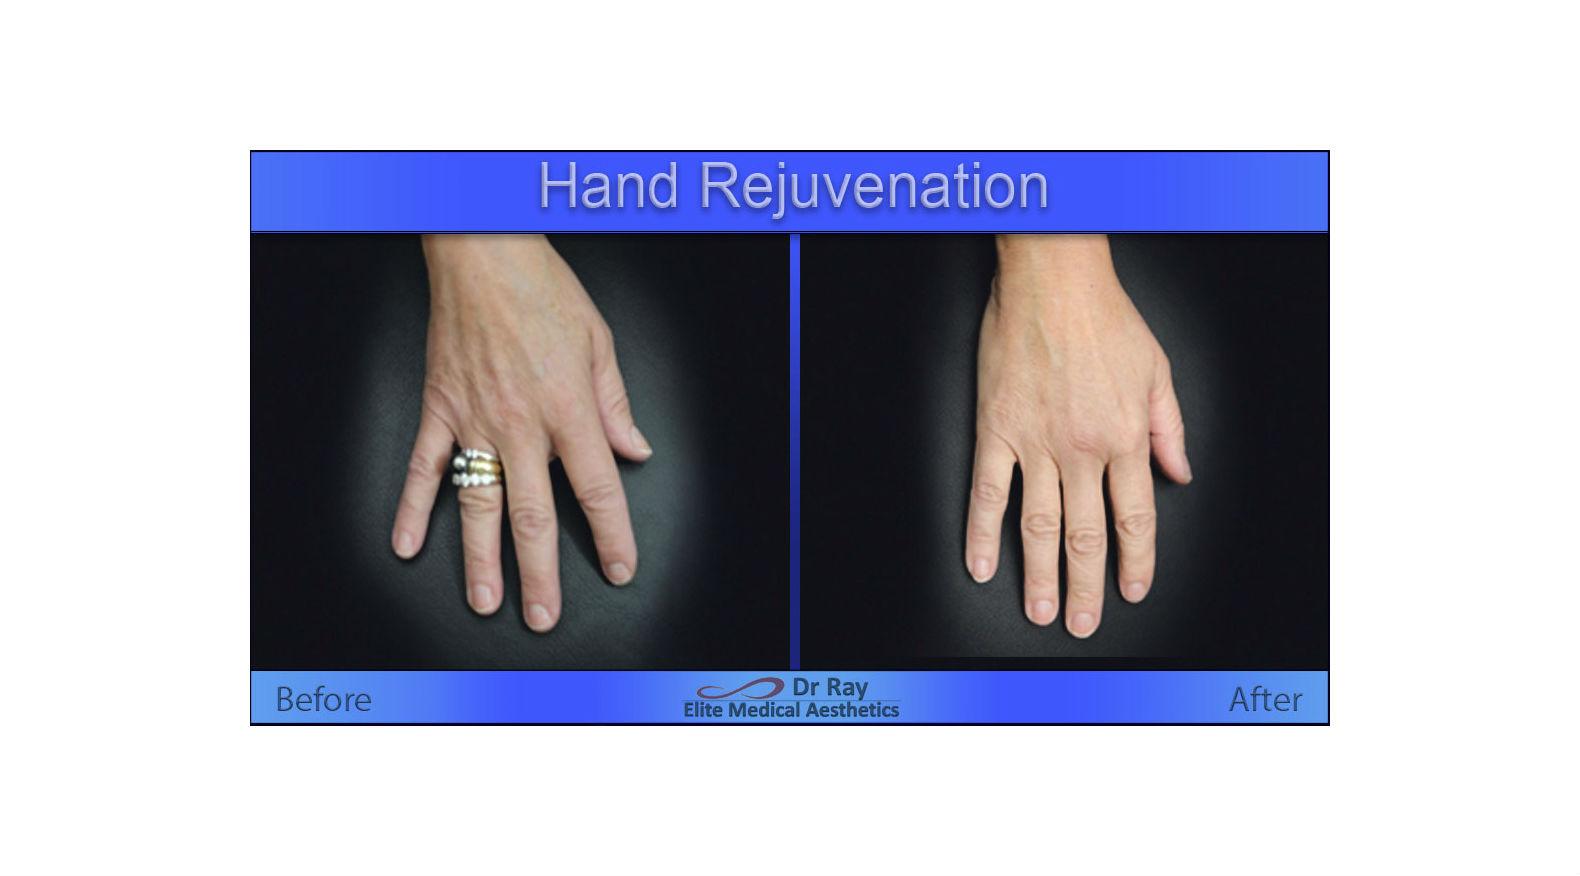 Best Hand rejuvenation in Sacramento and walnut creek area